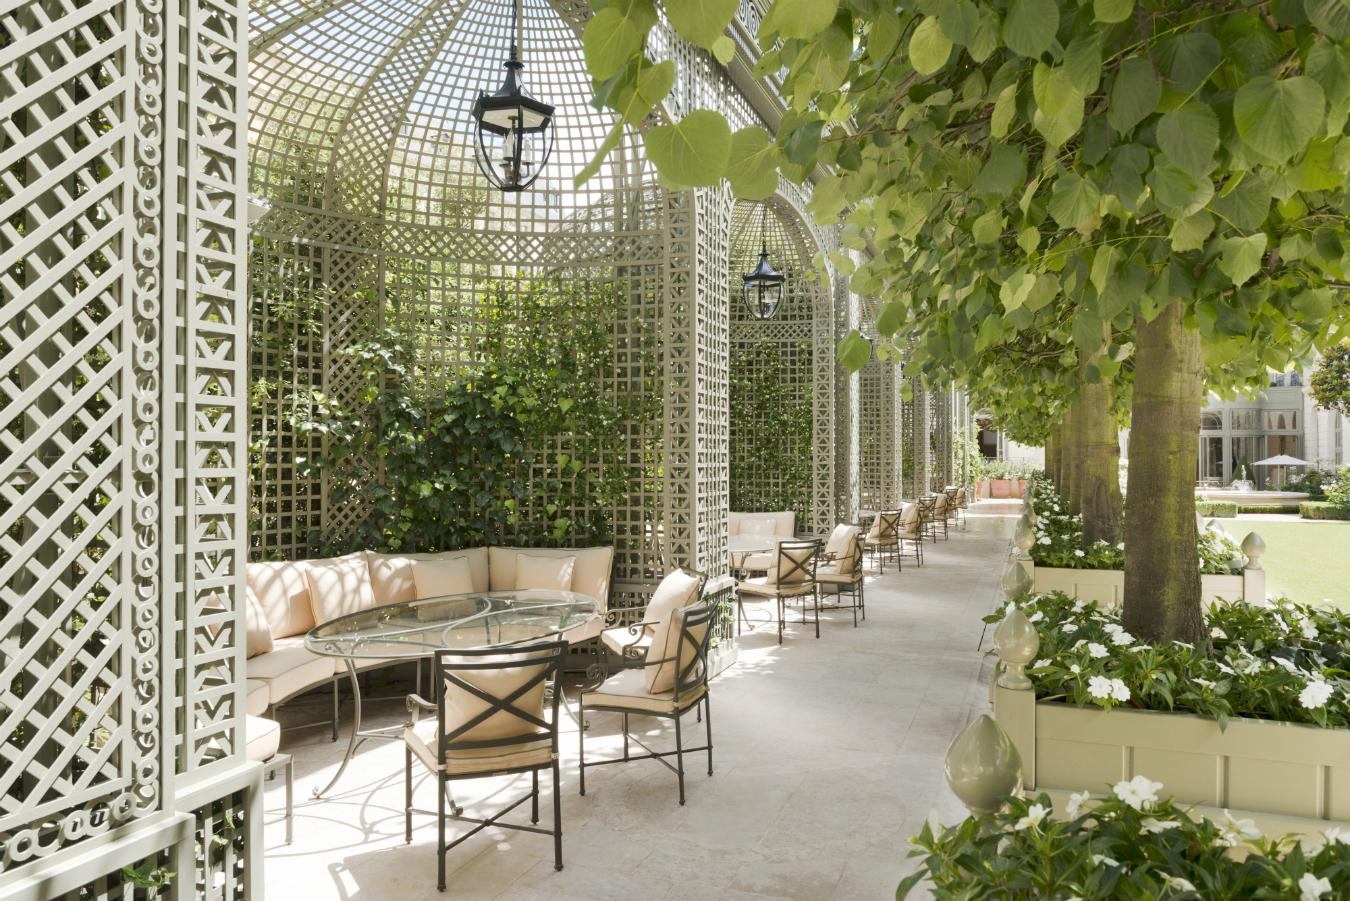 Grand-Jardin-©-Vincent-Leroux-3